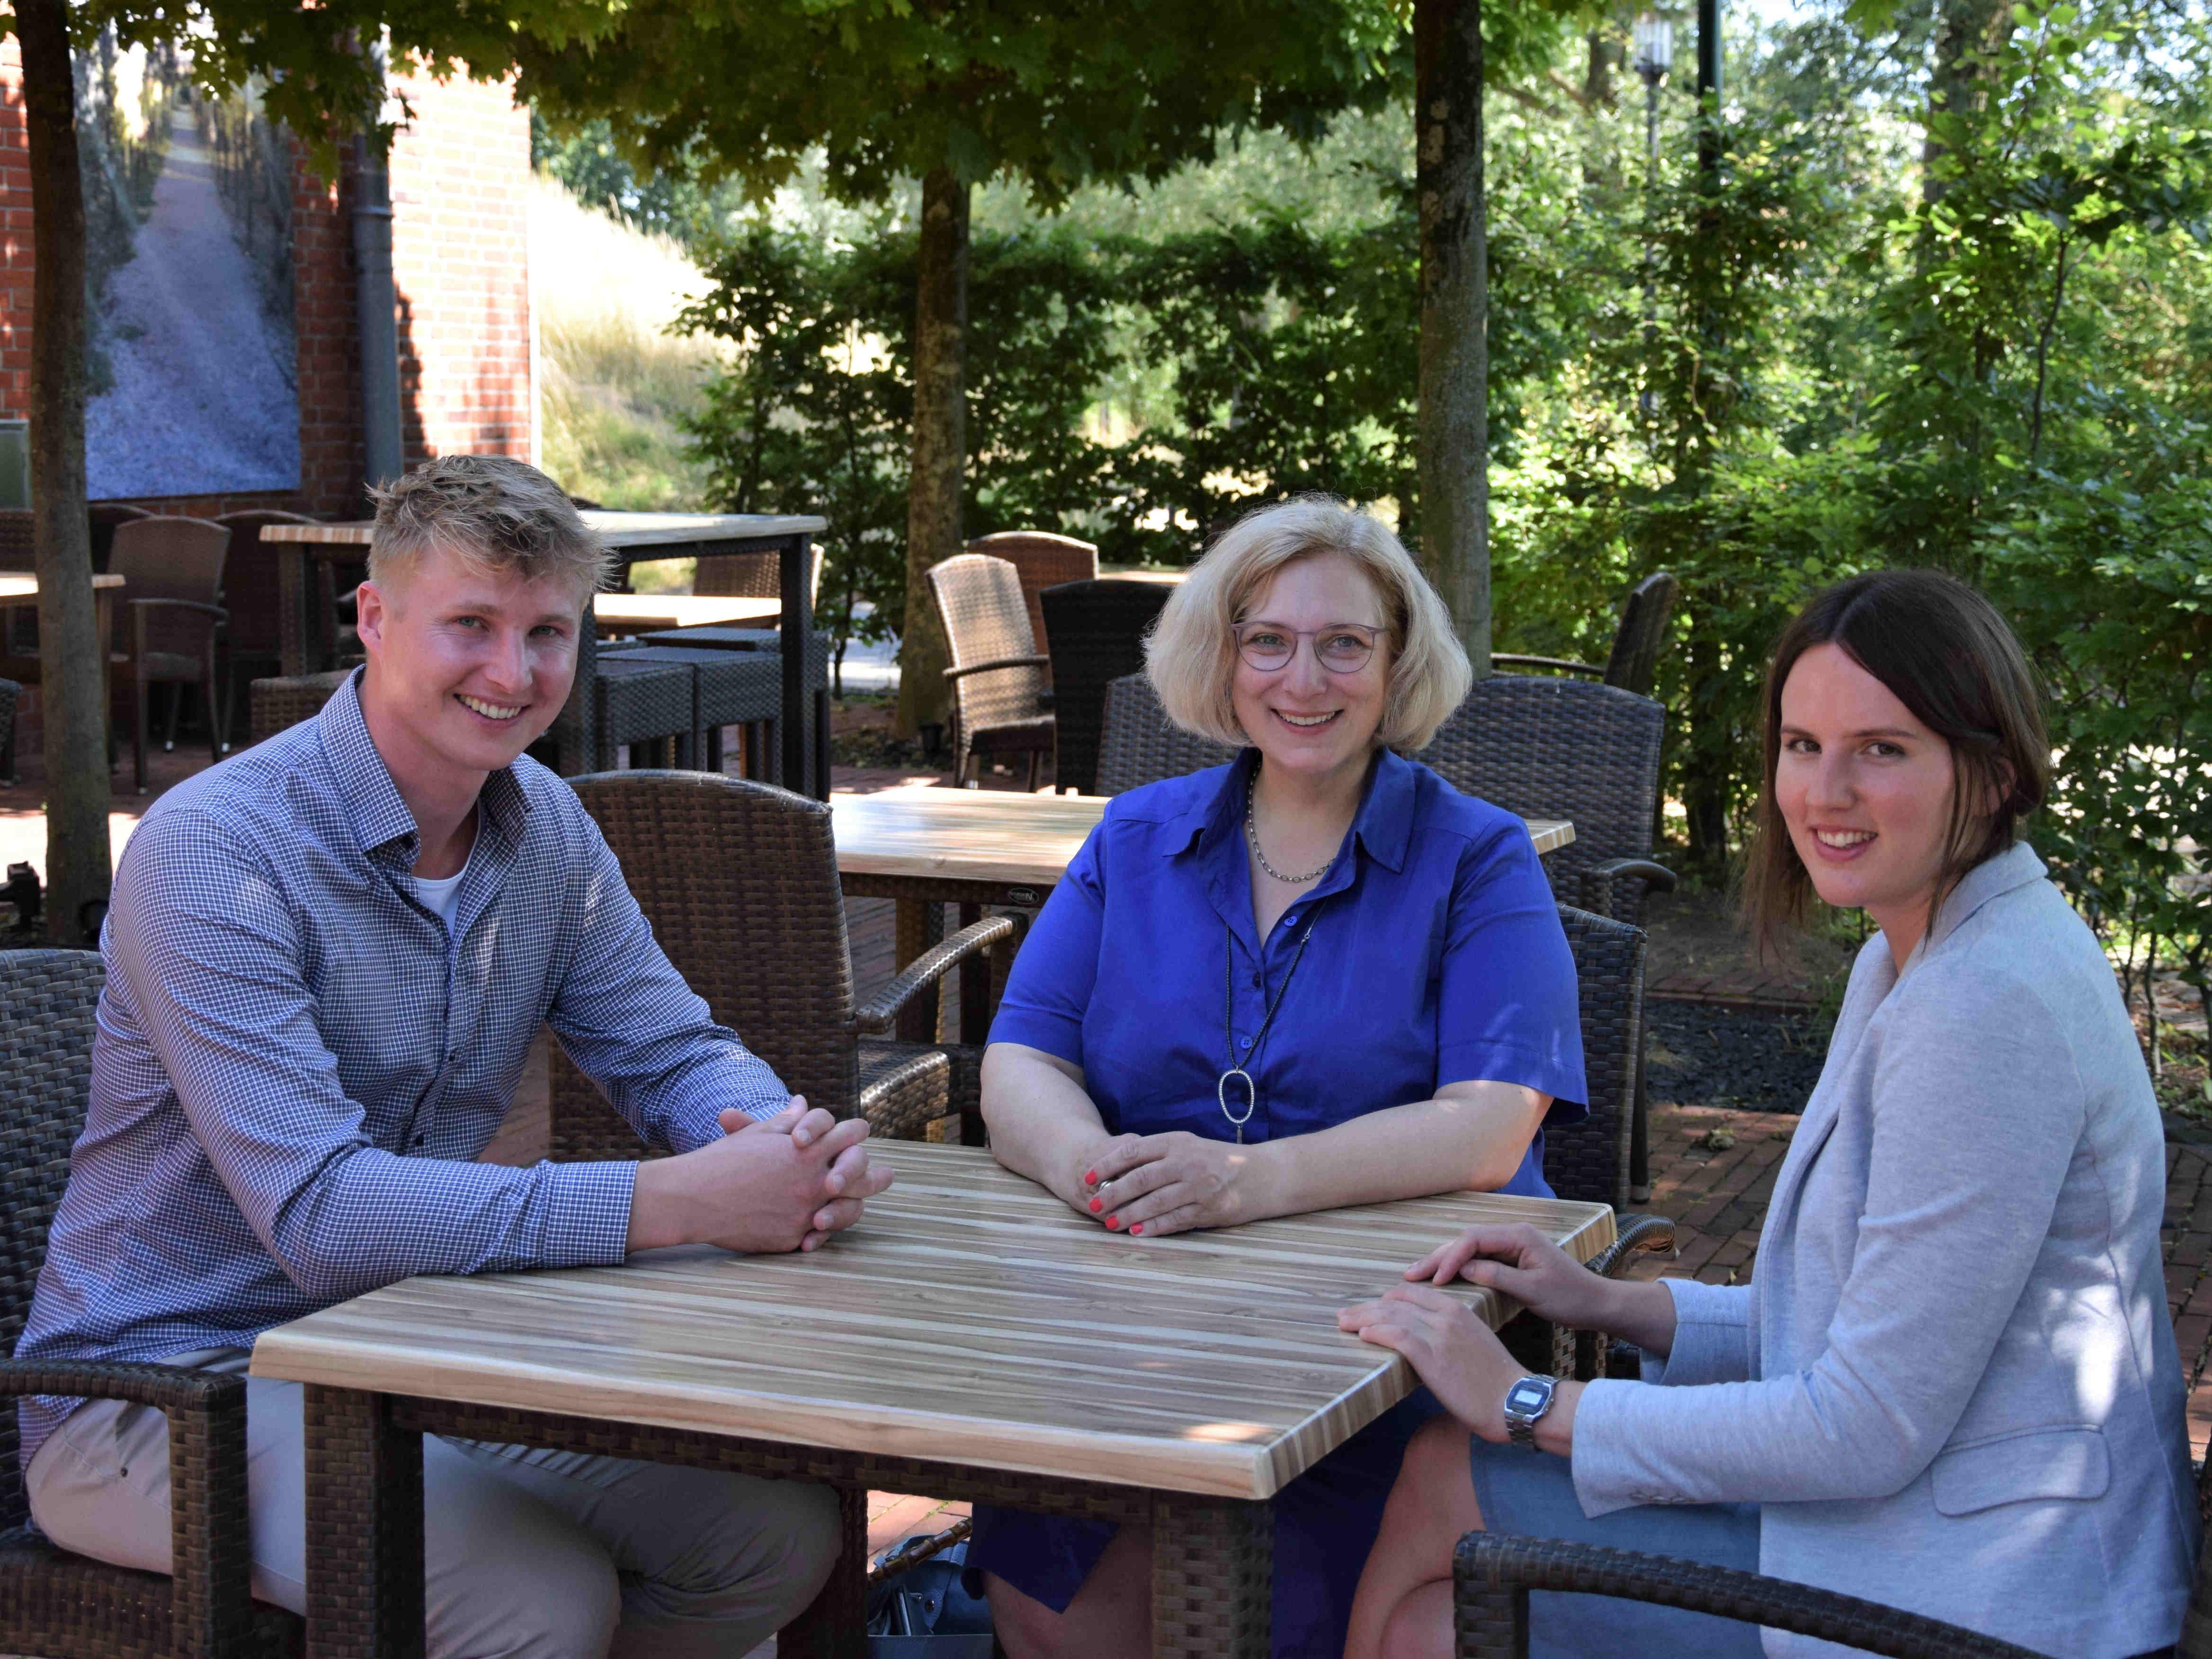 Manuel-Maurice Evers, Dr. Daniela De Ridder und Linda Röhl